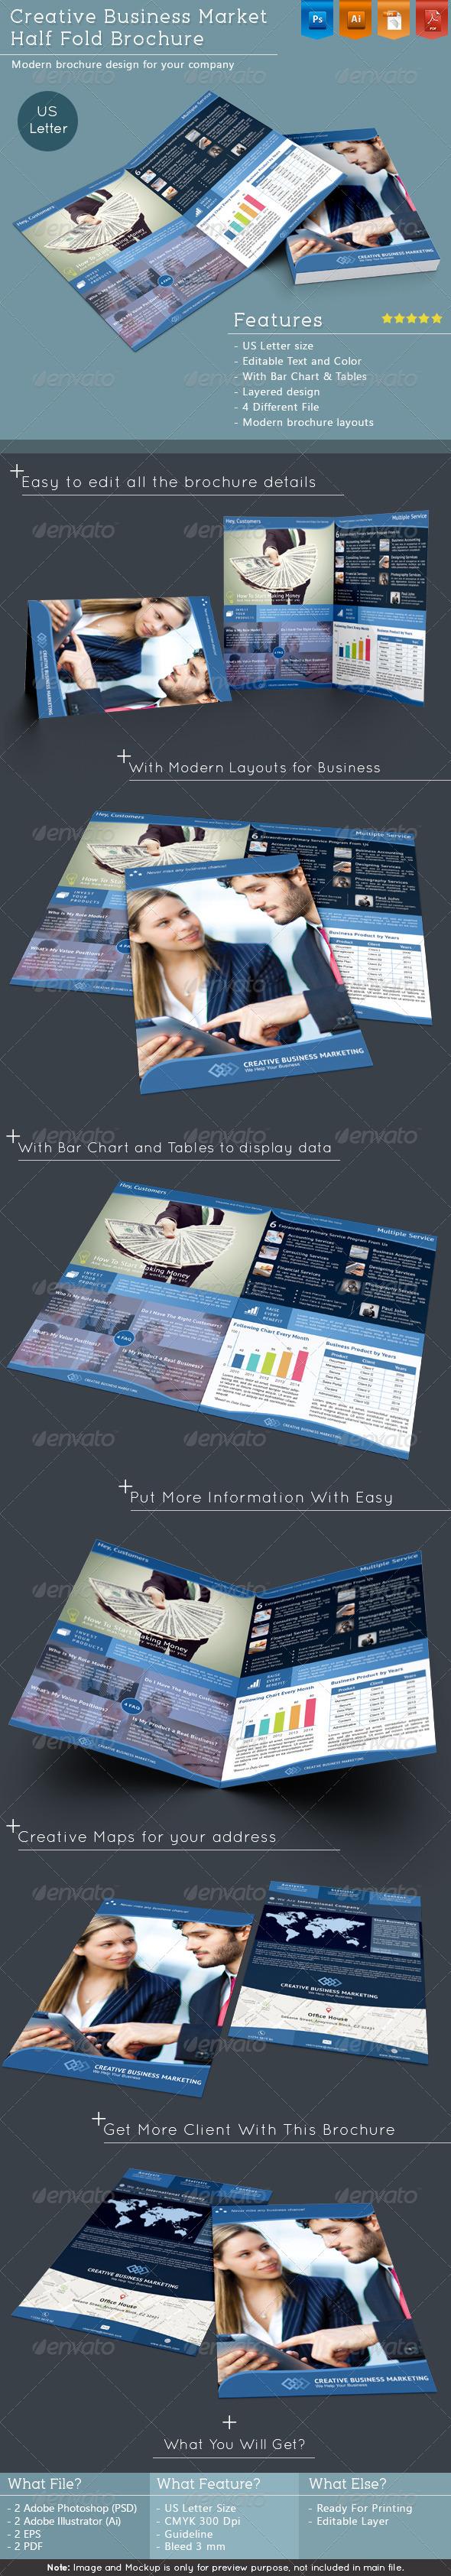 Creative Business Market Half Fold Brochure - Corporate Brochures